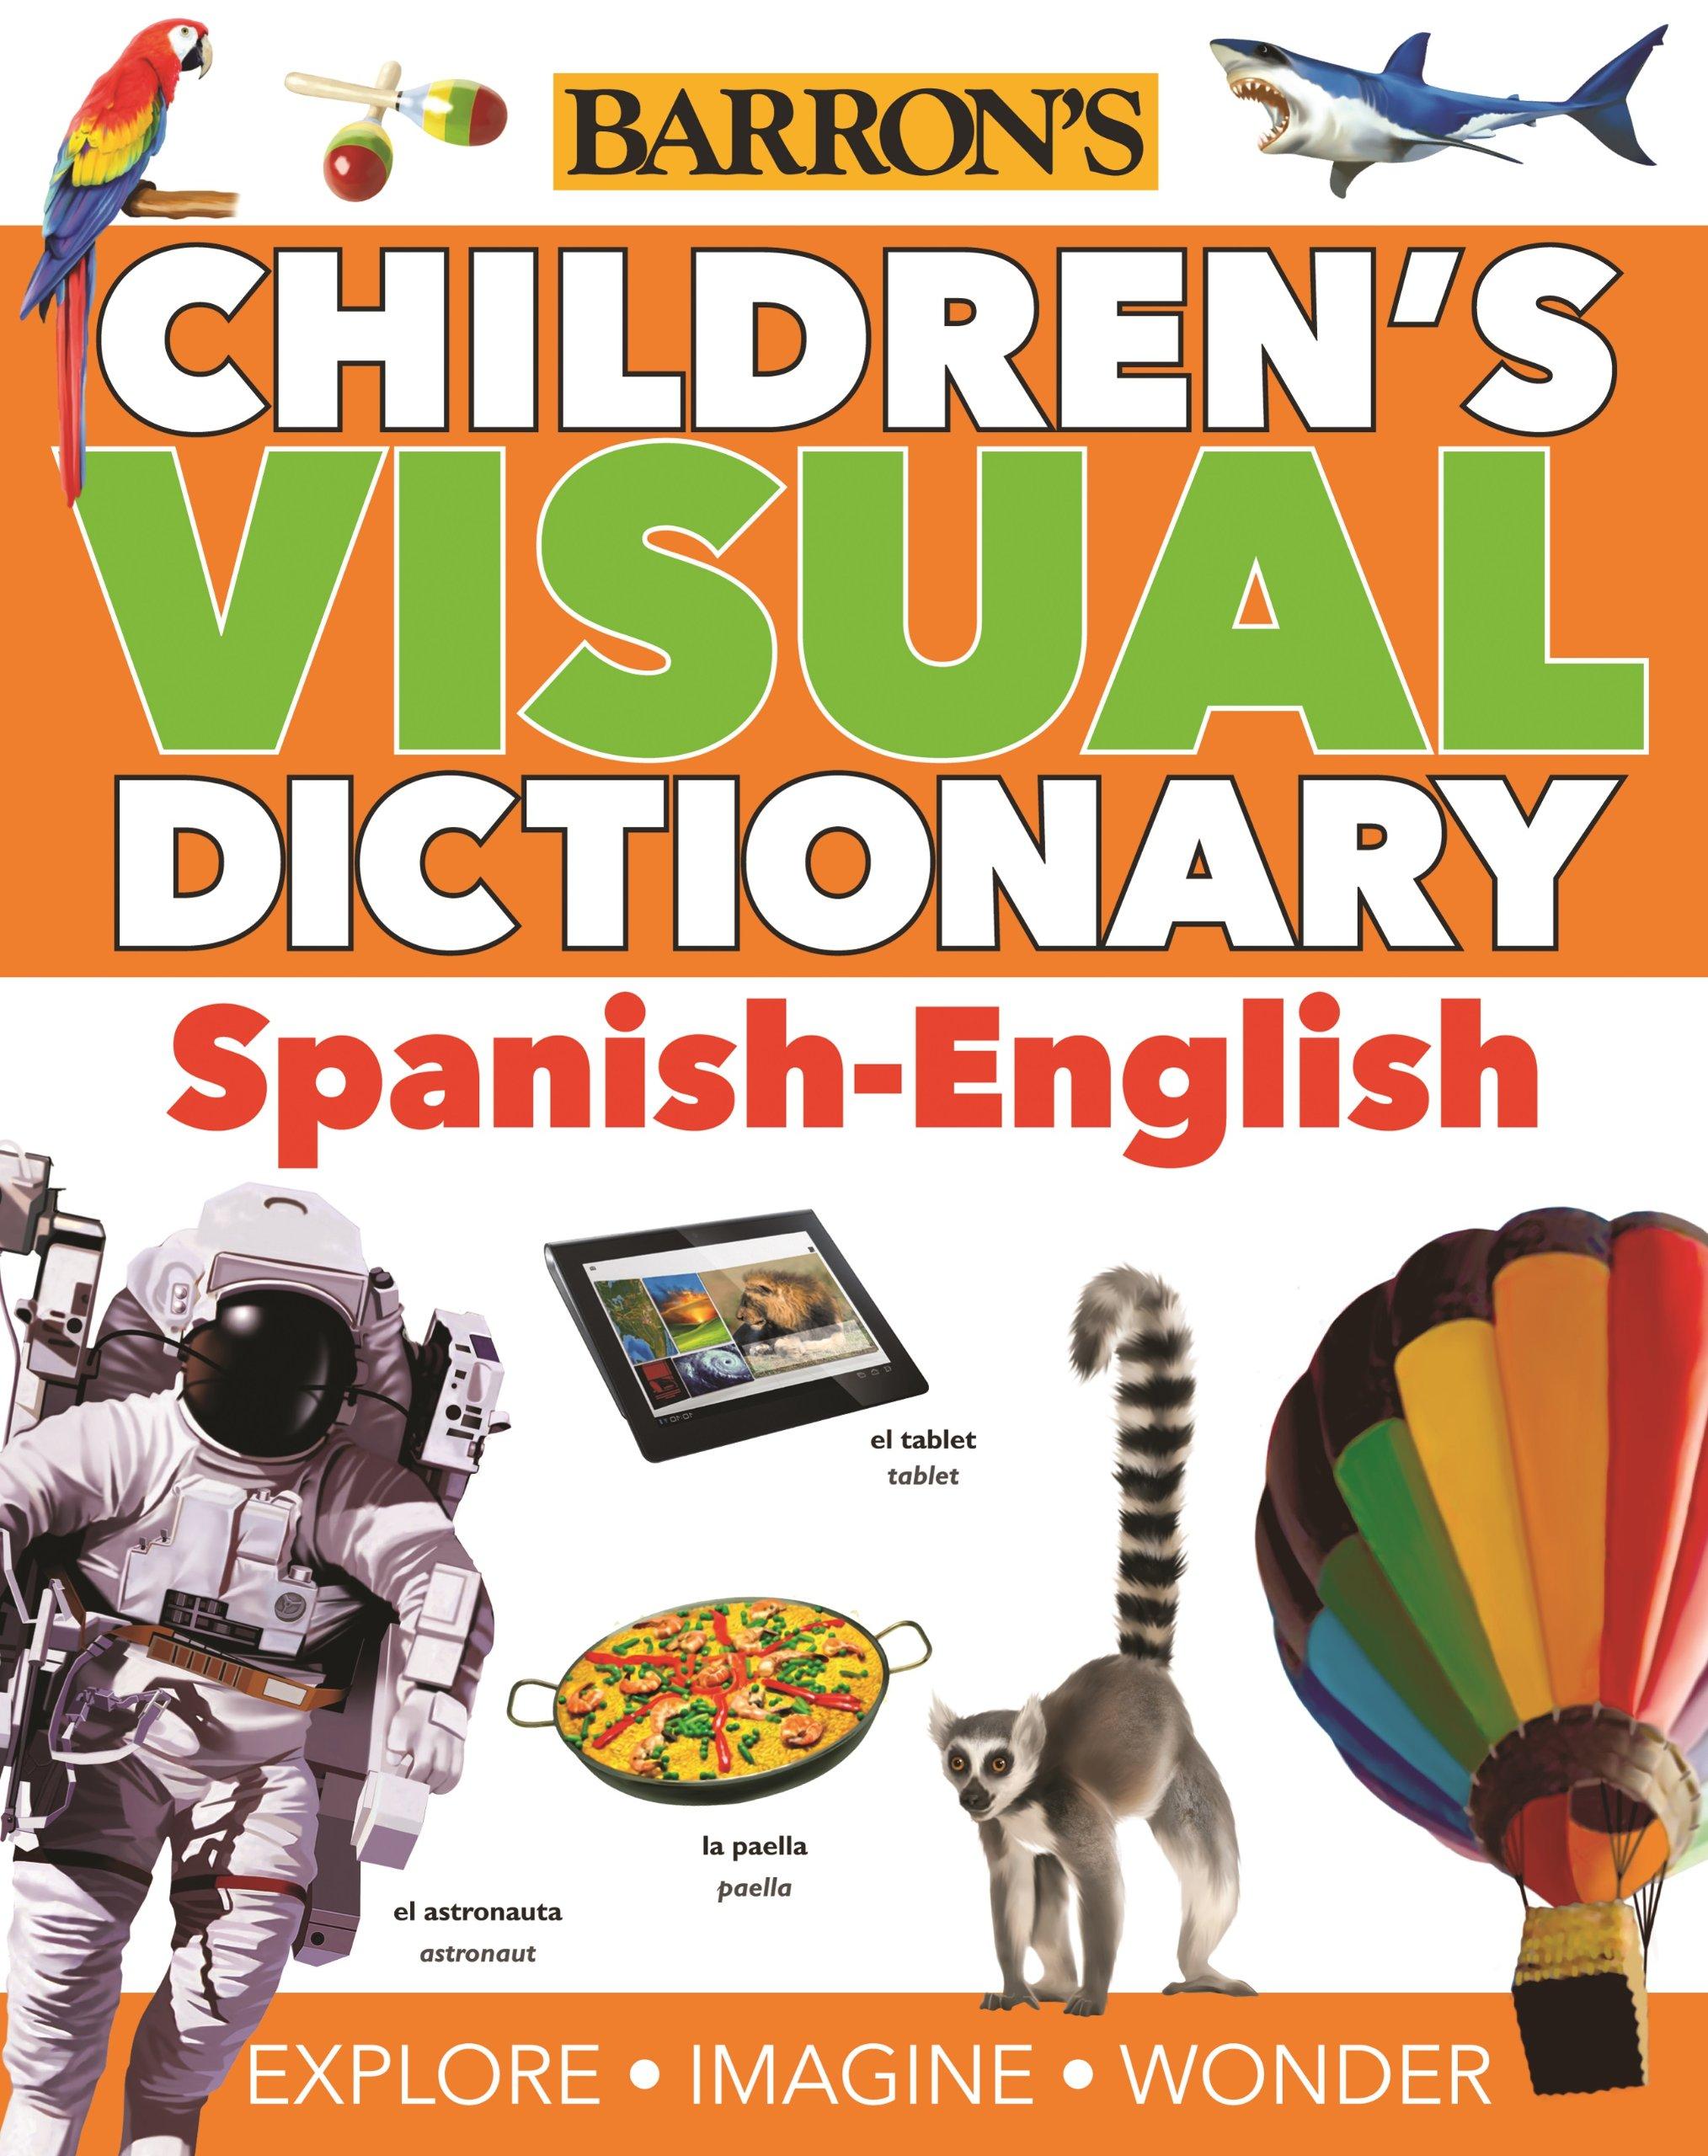 Children s visual dictionary spanish english children s visual dictionaries oxford university press 9781438004525 amazon com books